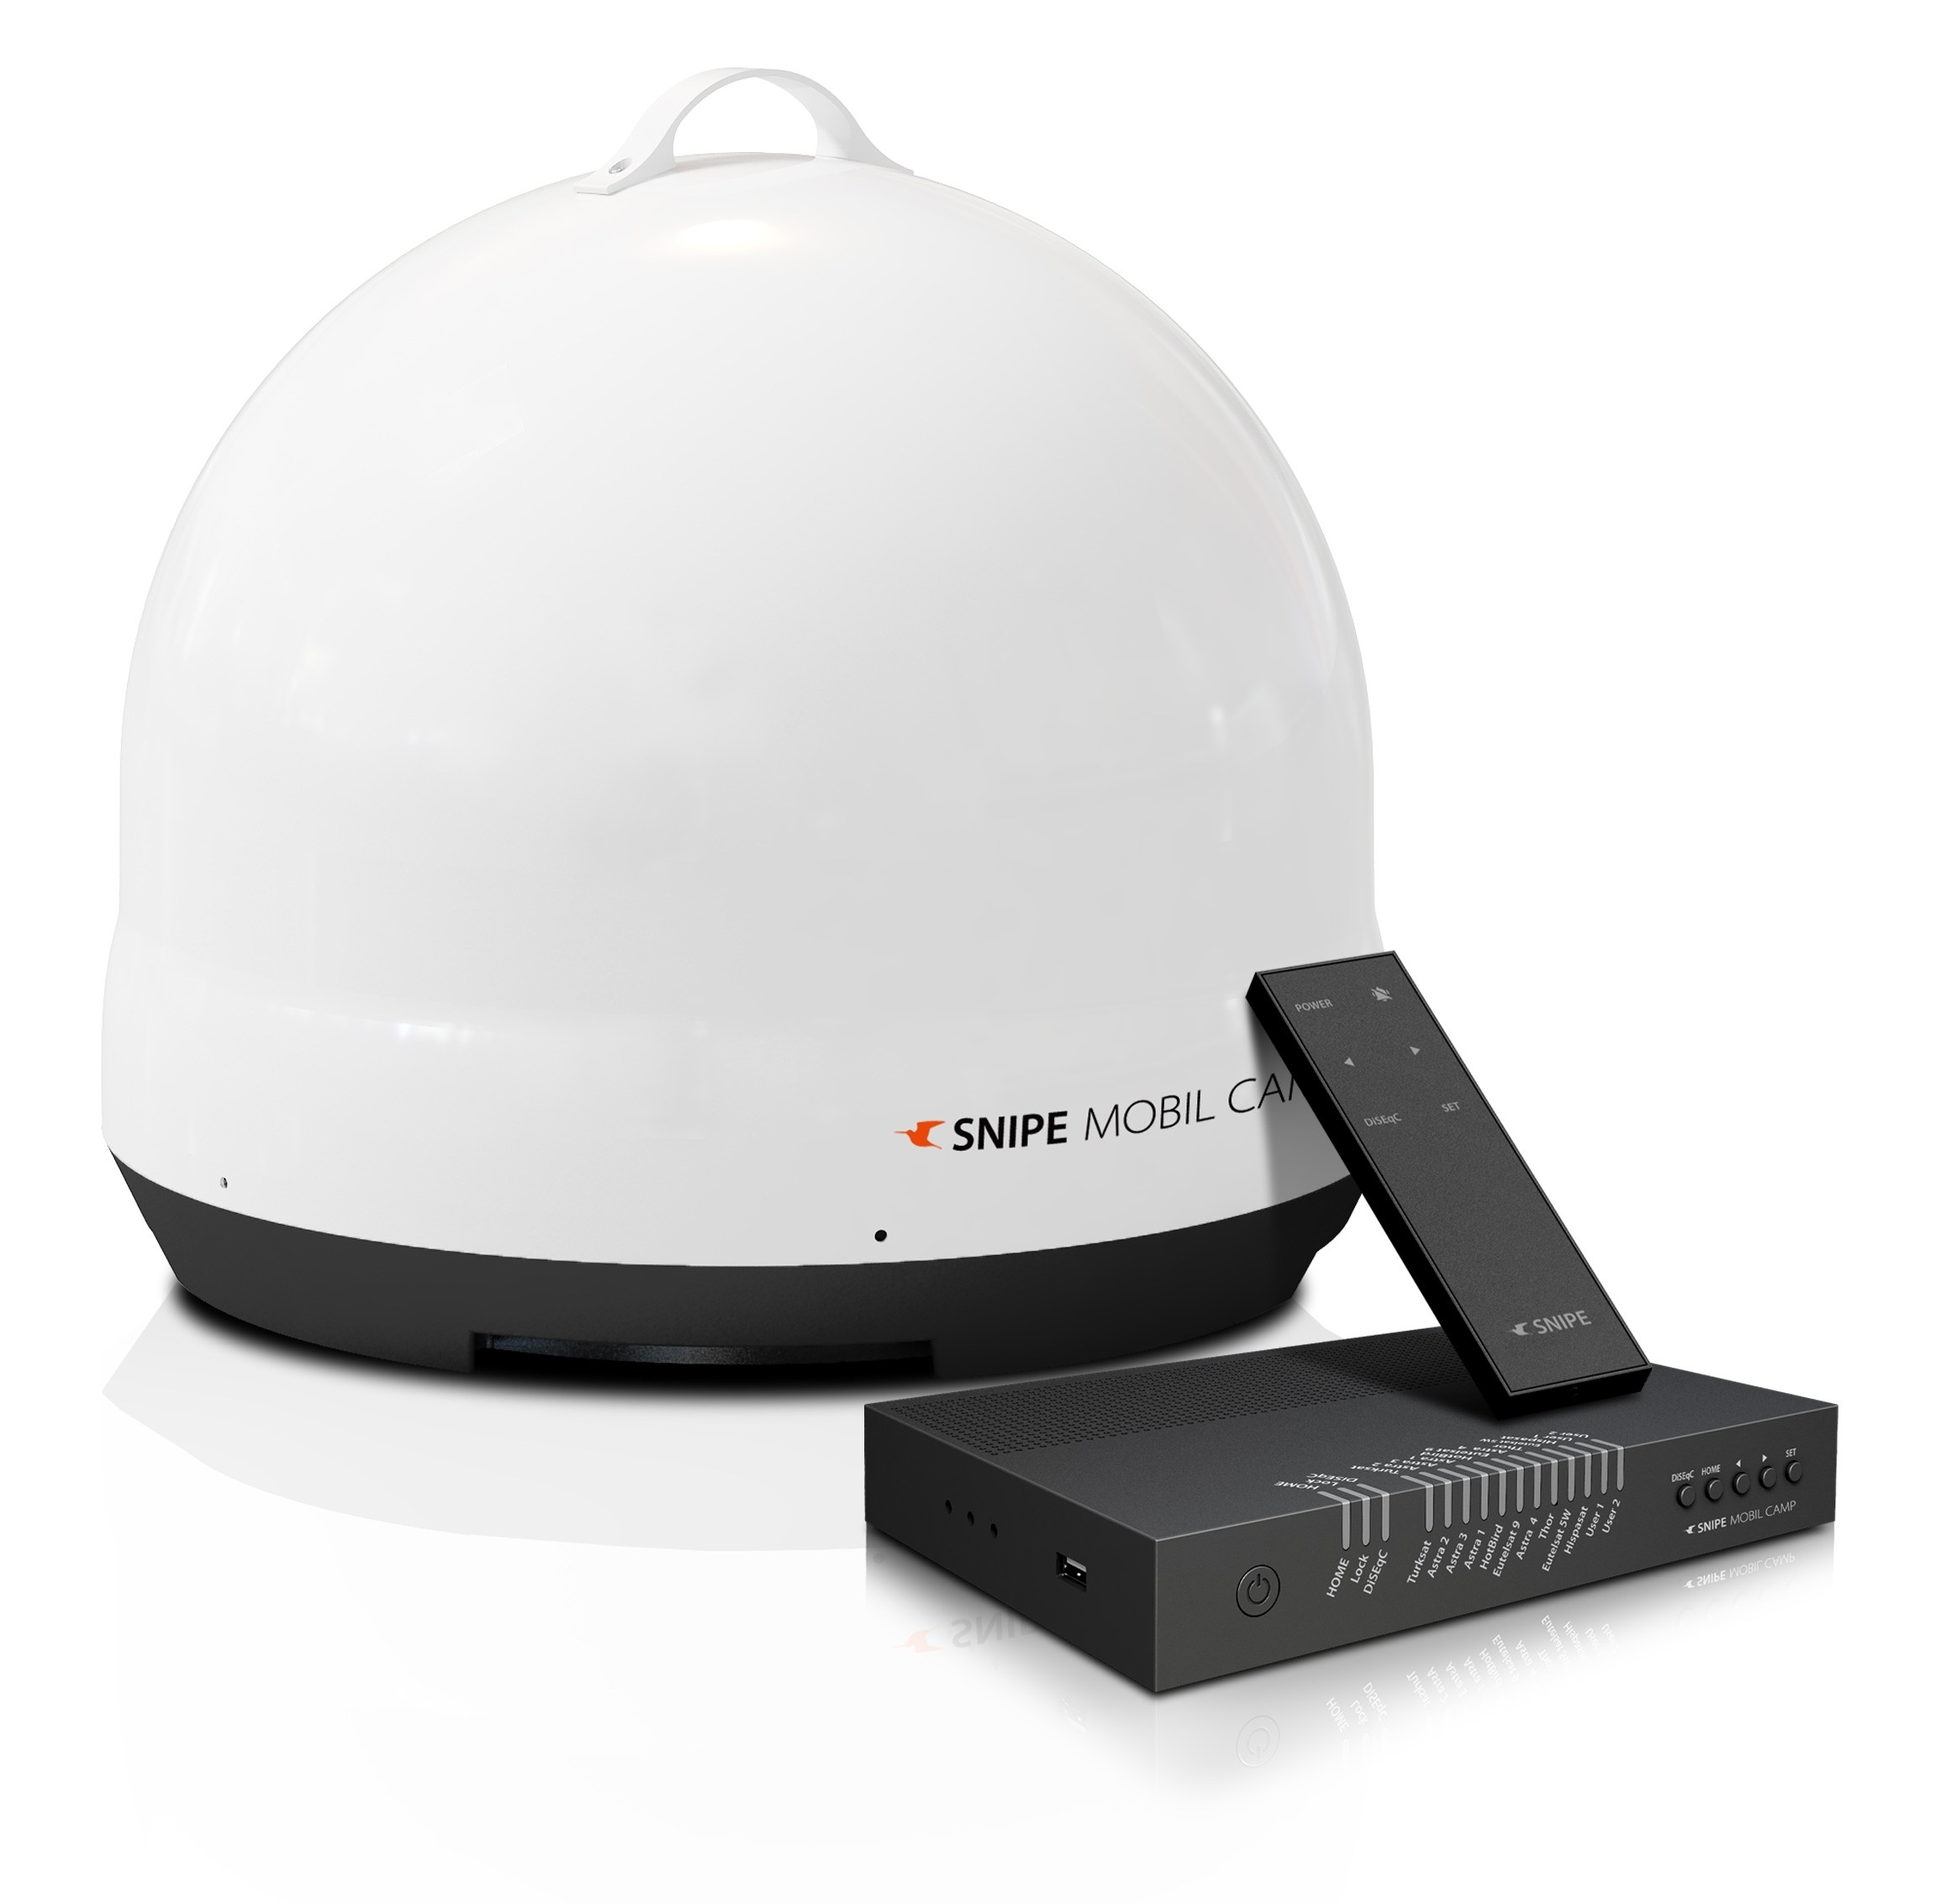 Selfsat SNIPE Mobil Camp Single Portable mobile Sat Antenne